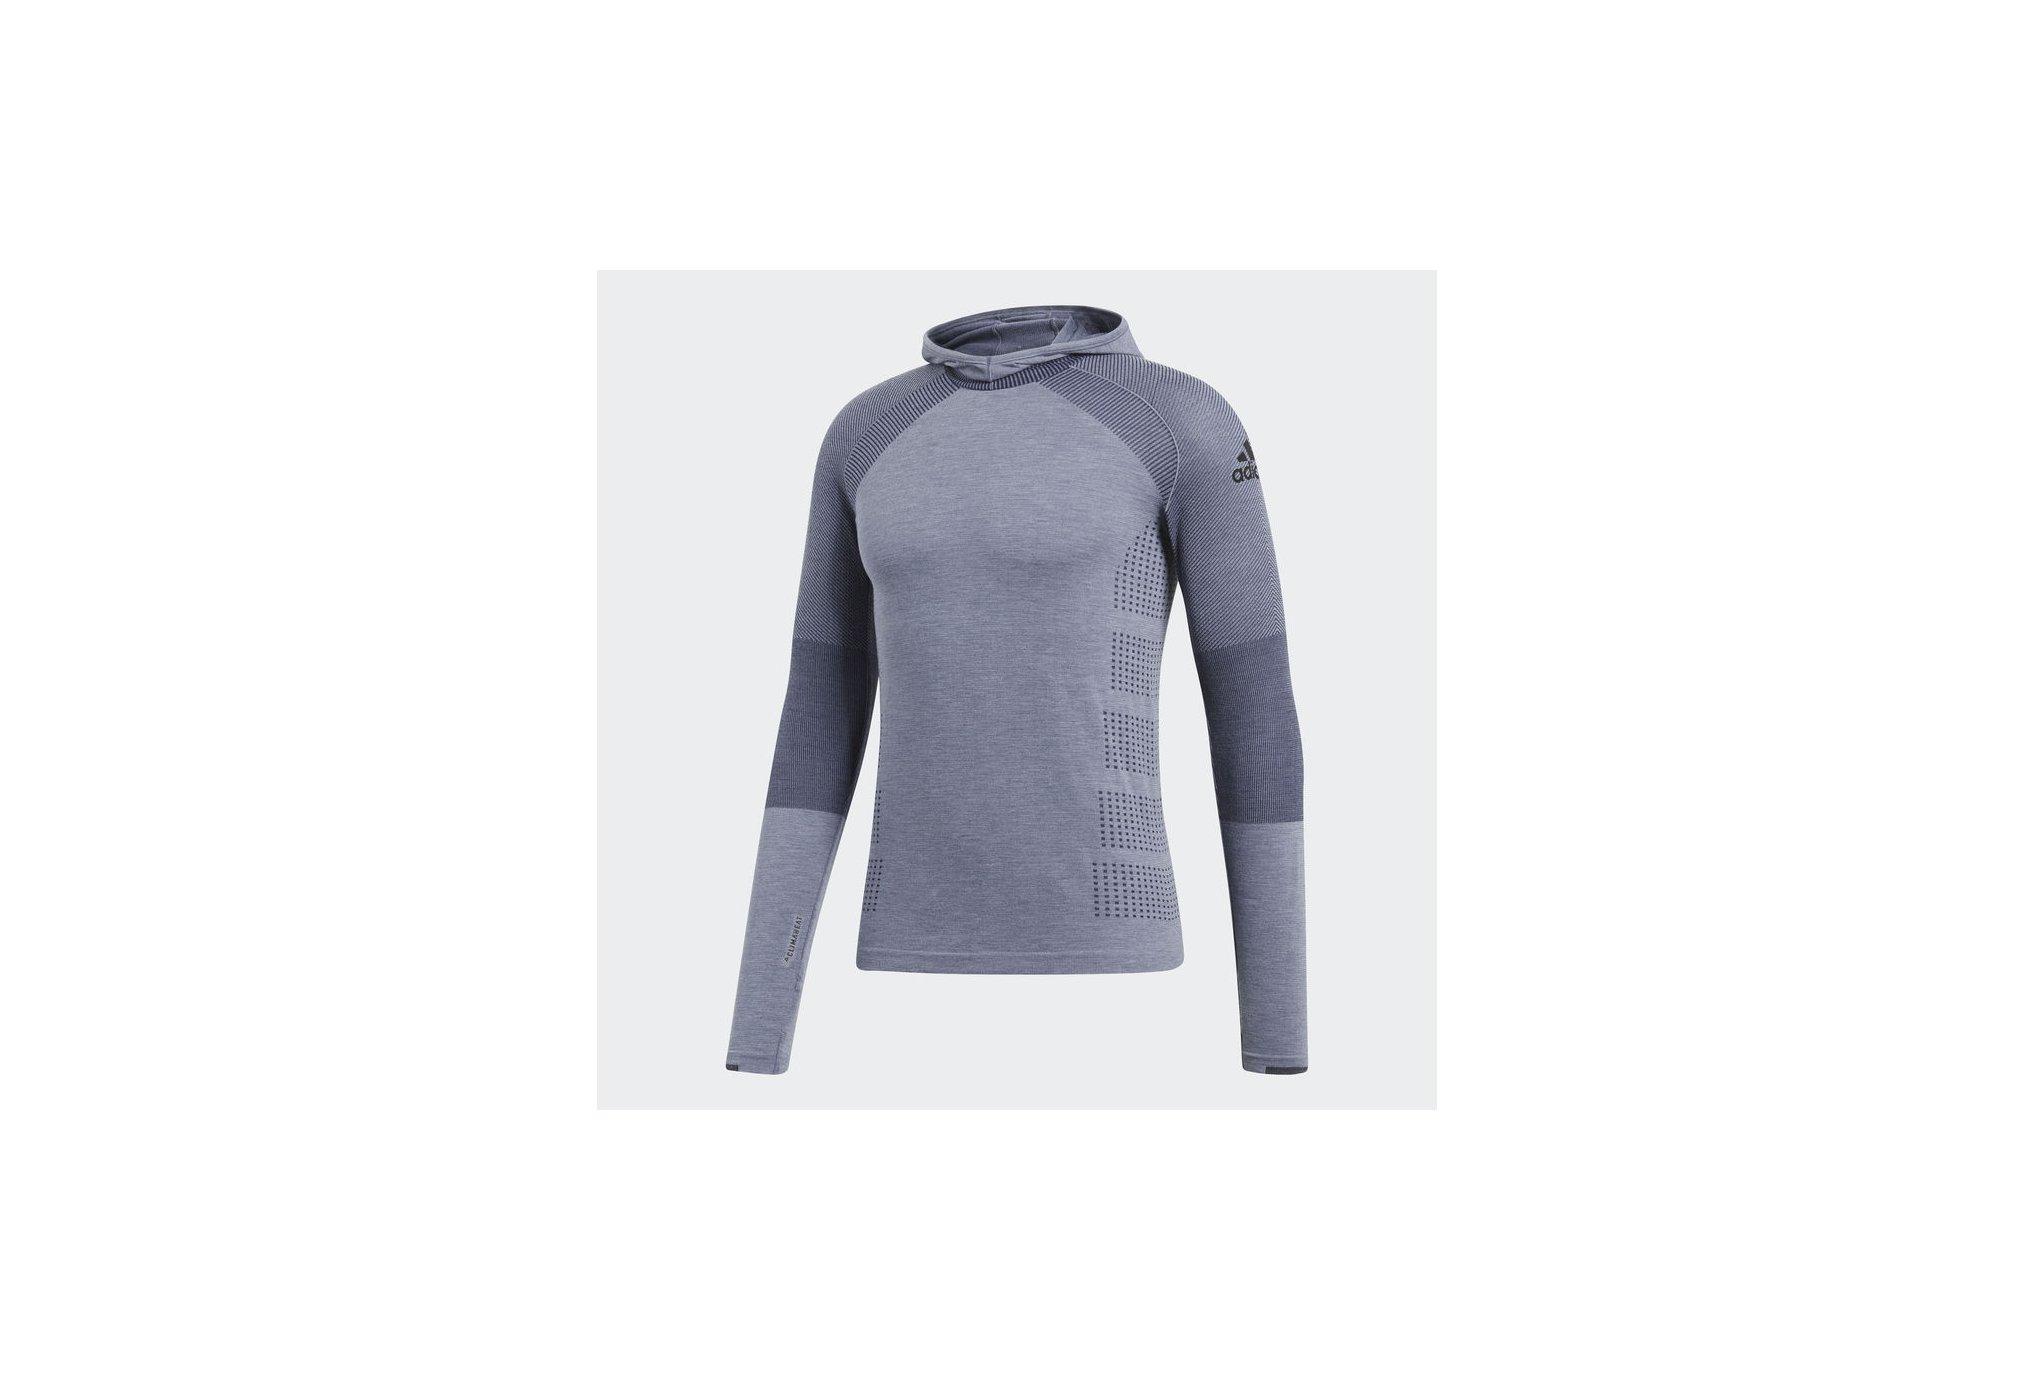 Adidas Climaheat primeknit m vêtement running homme